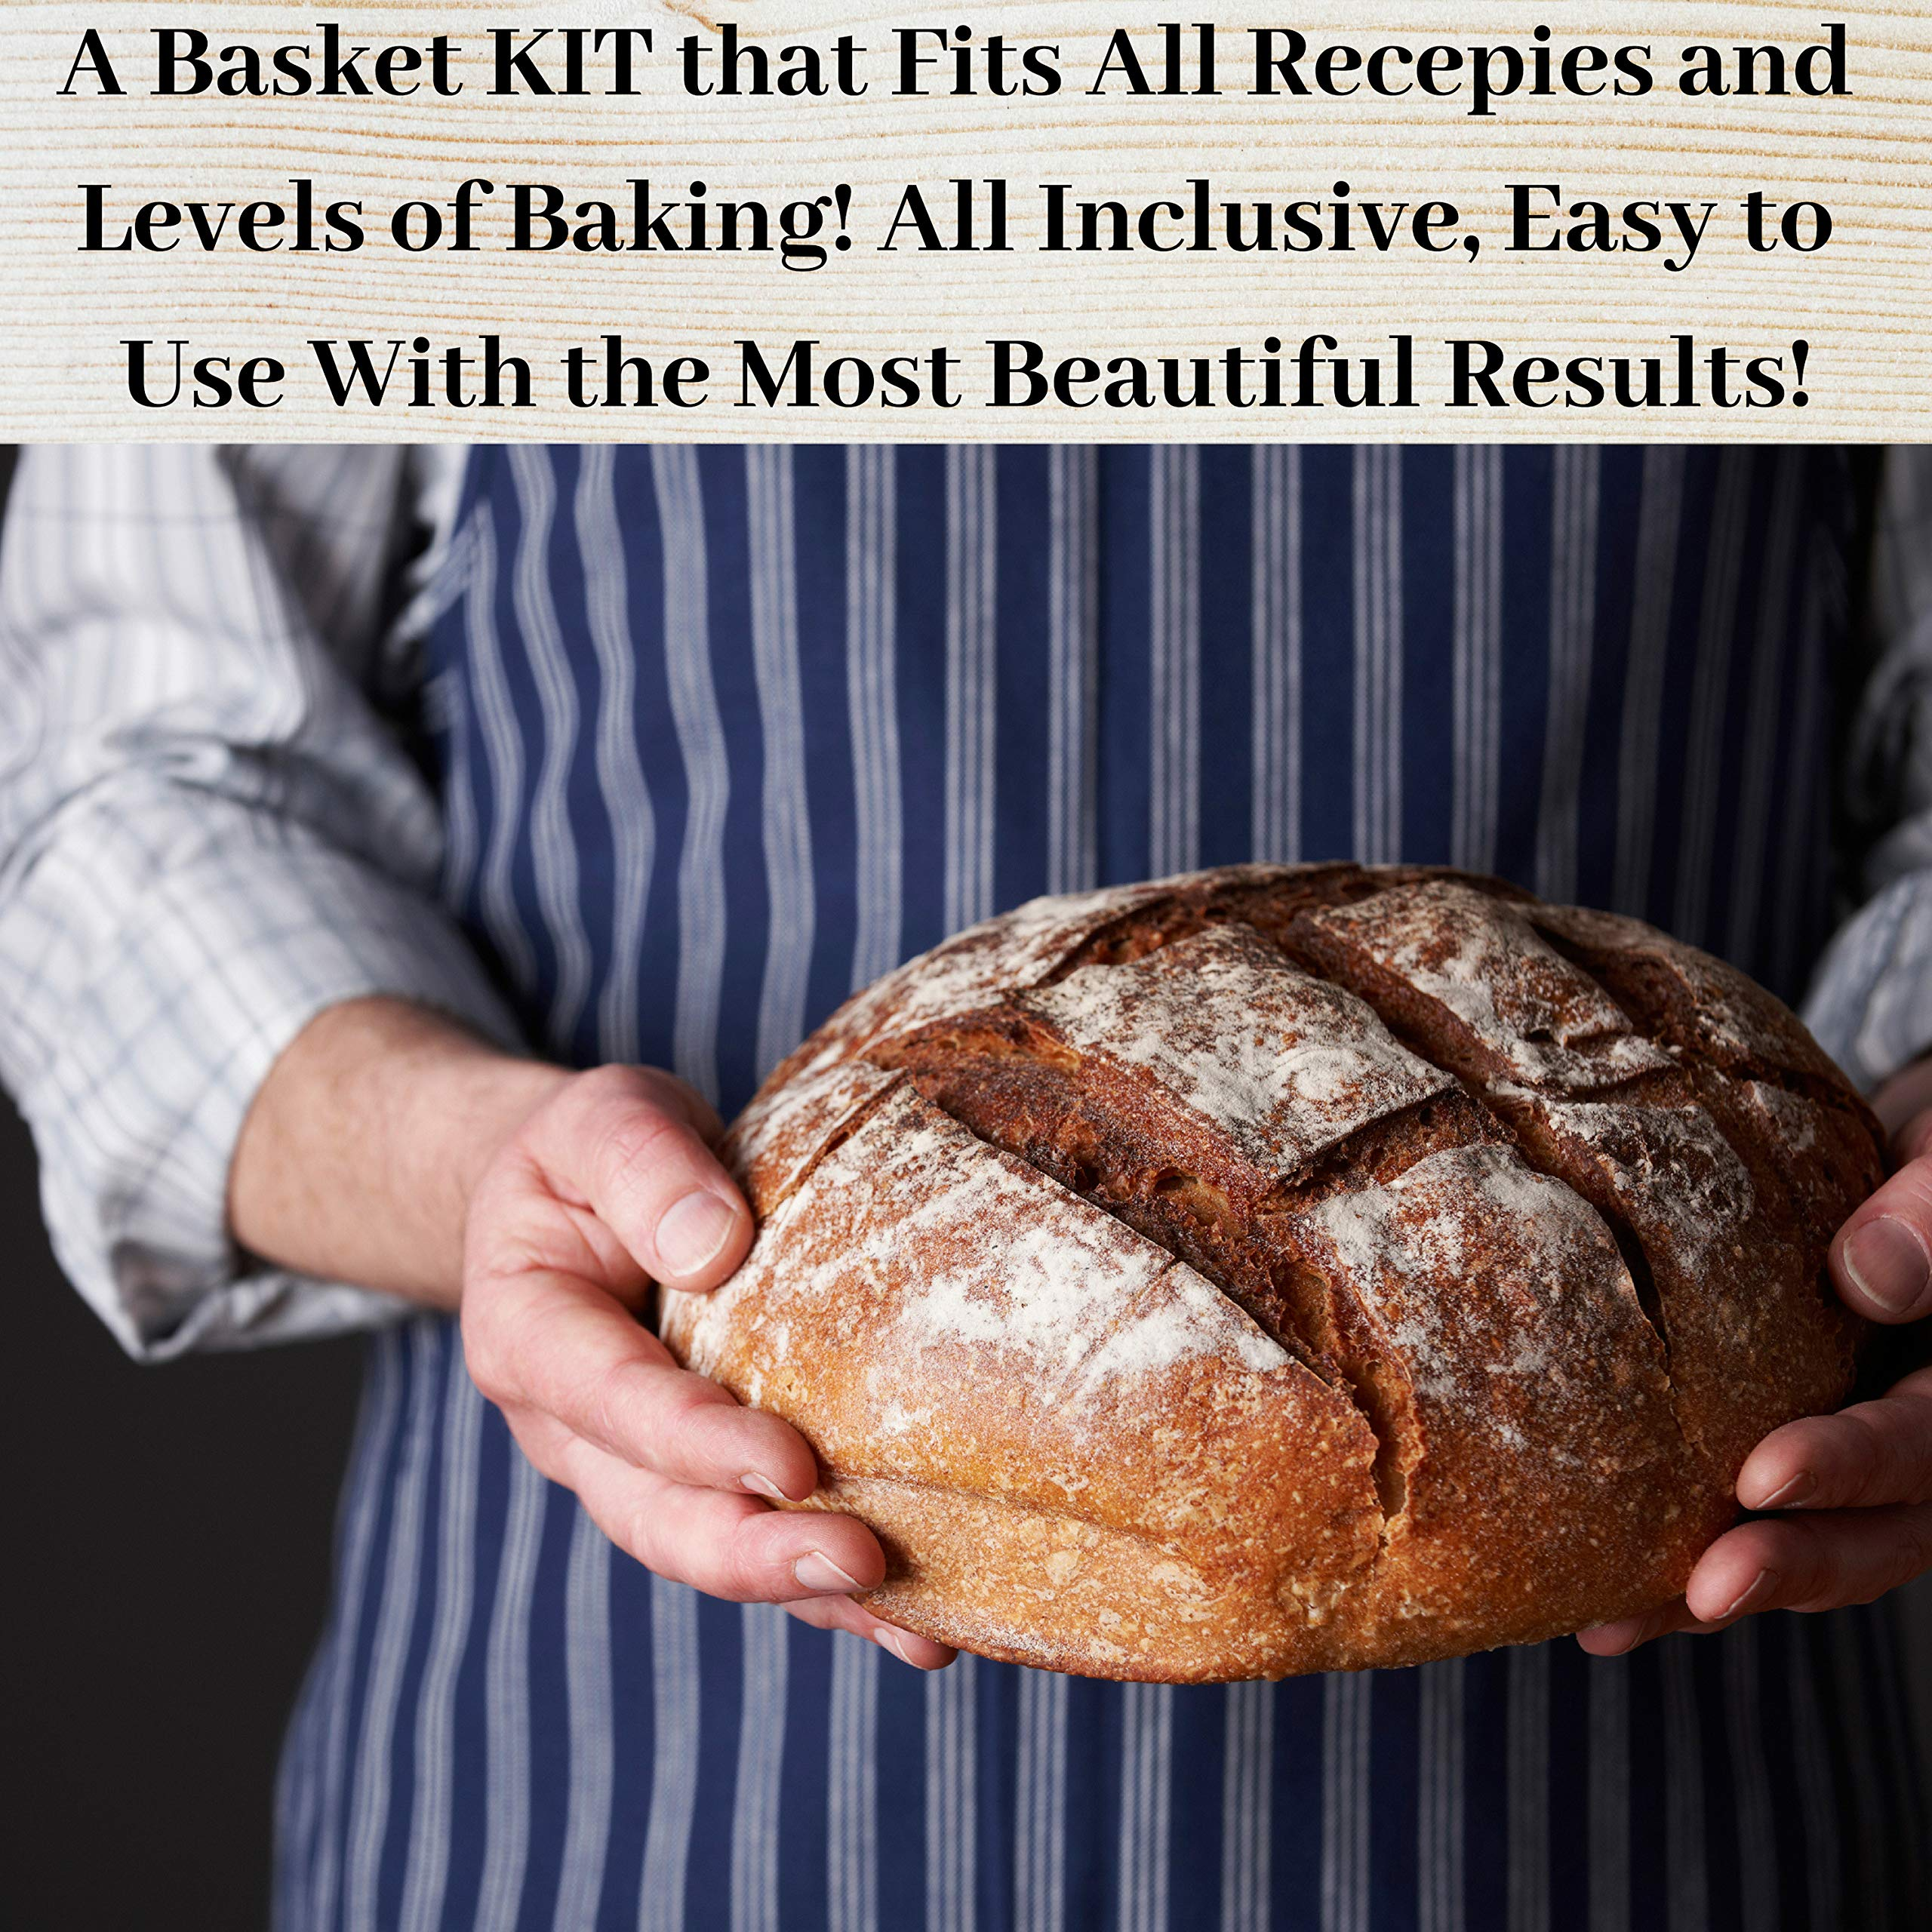 KIT 10 Inch Bread Basket Sourdough Starter - Banneton Proofing Basket, Dough Scraper, Bread Lame, Liner & FREE EBOOK - Bread Proofing Basket for Bread Baking Supplies, Bread Making Tools by PremiumBake (Image #8)